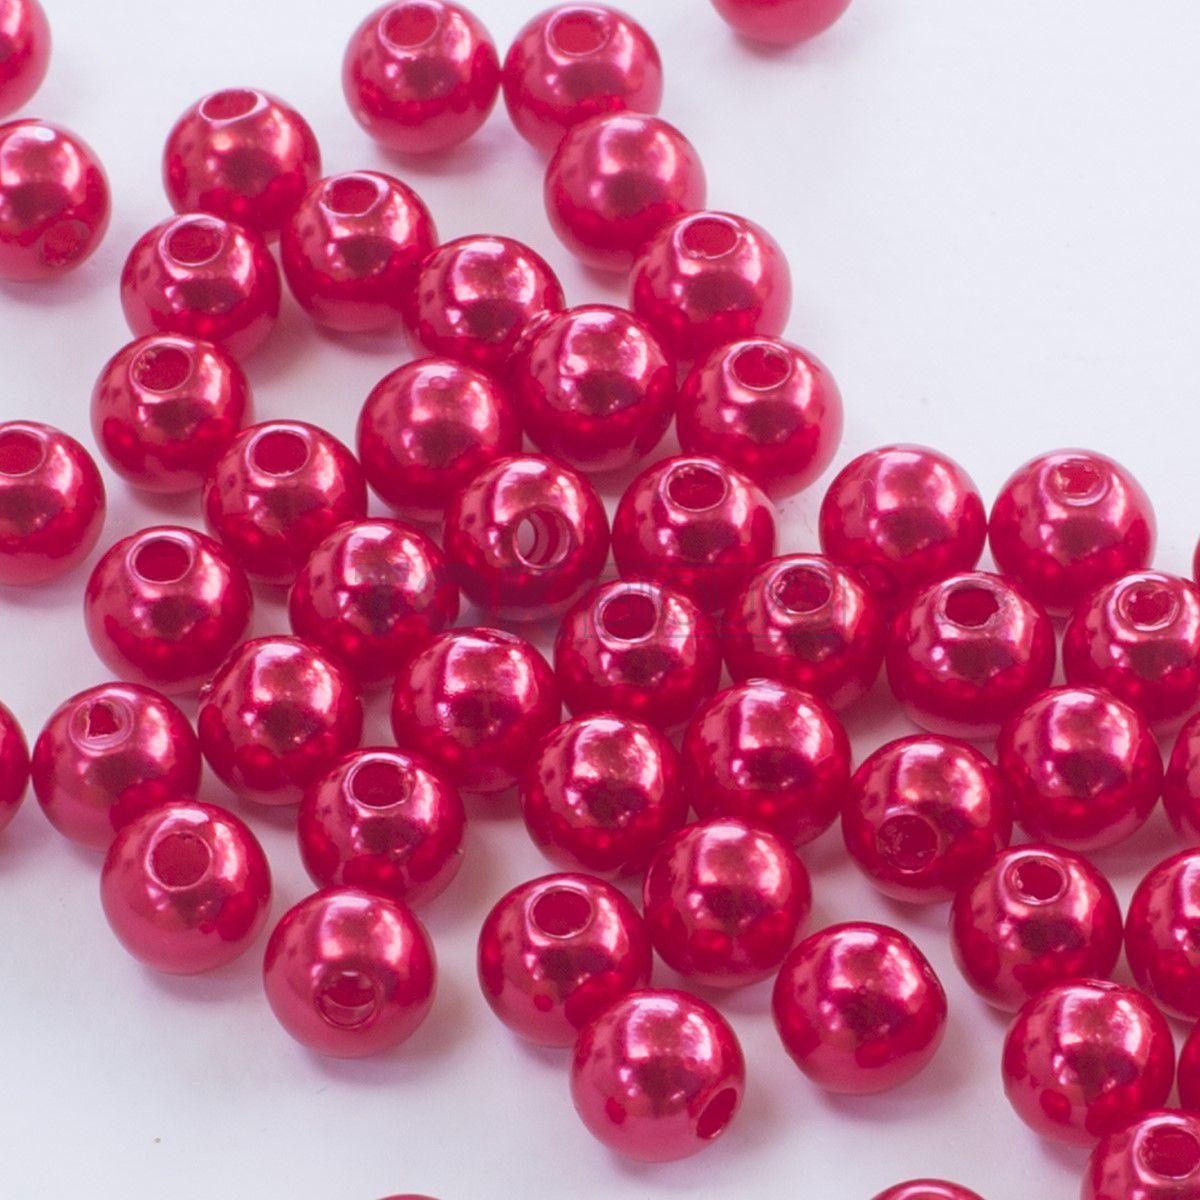 Pérola Redonda Abs 3mm - Vermelho - 25g